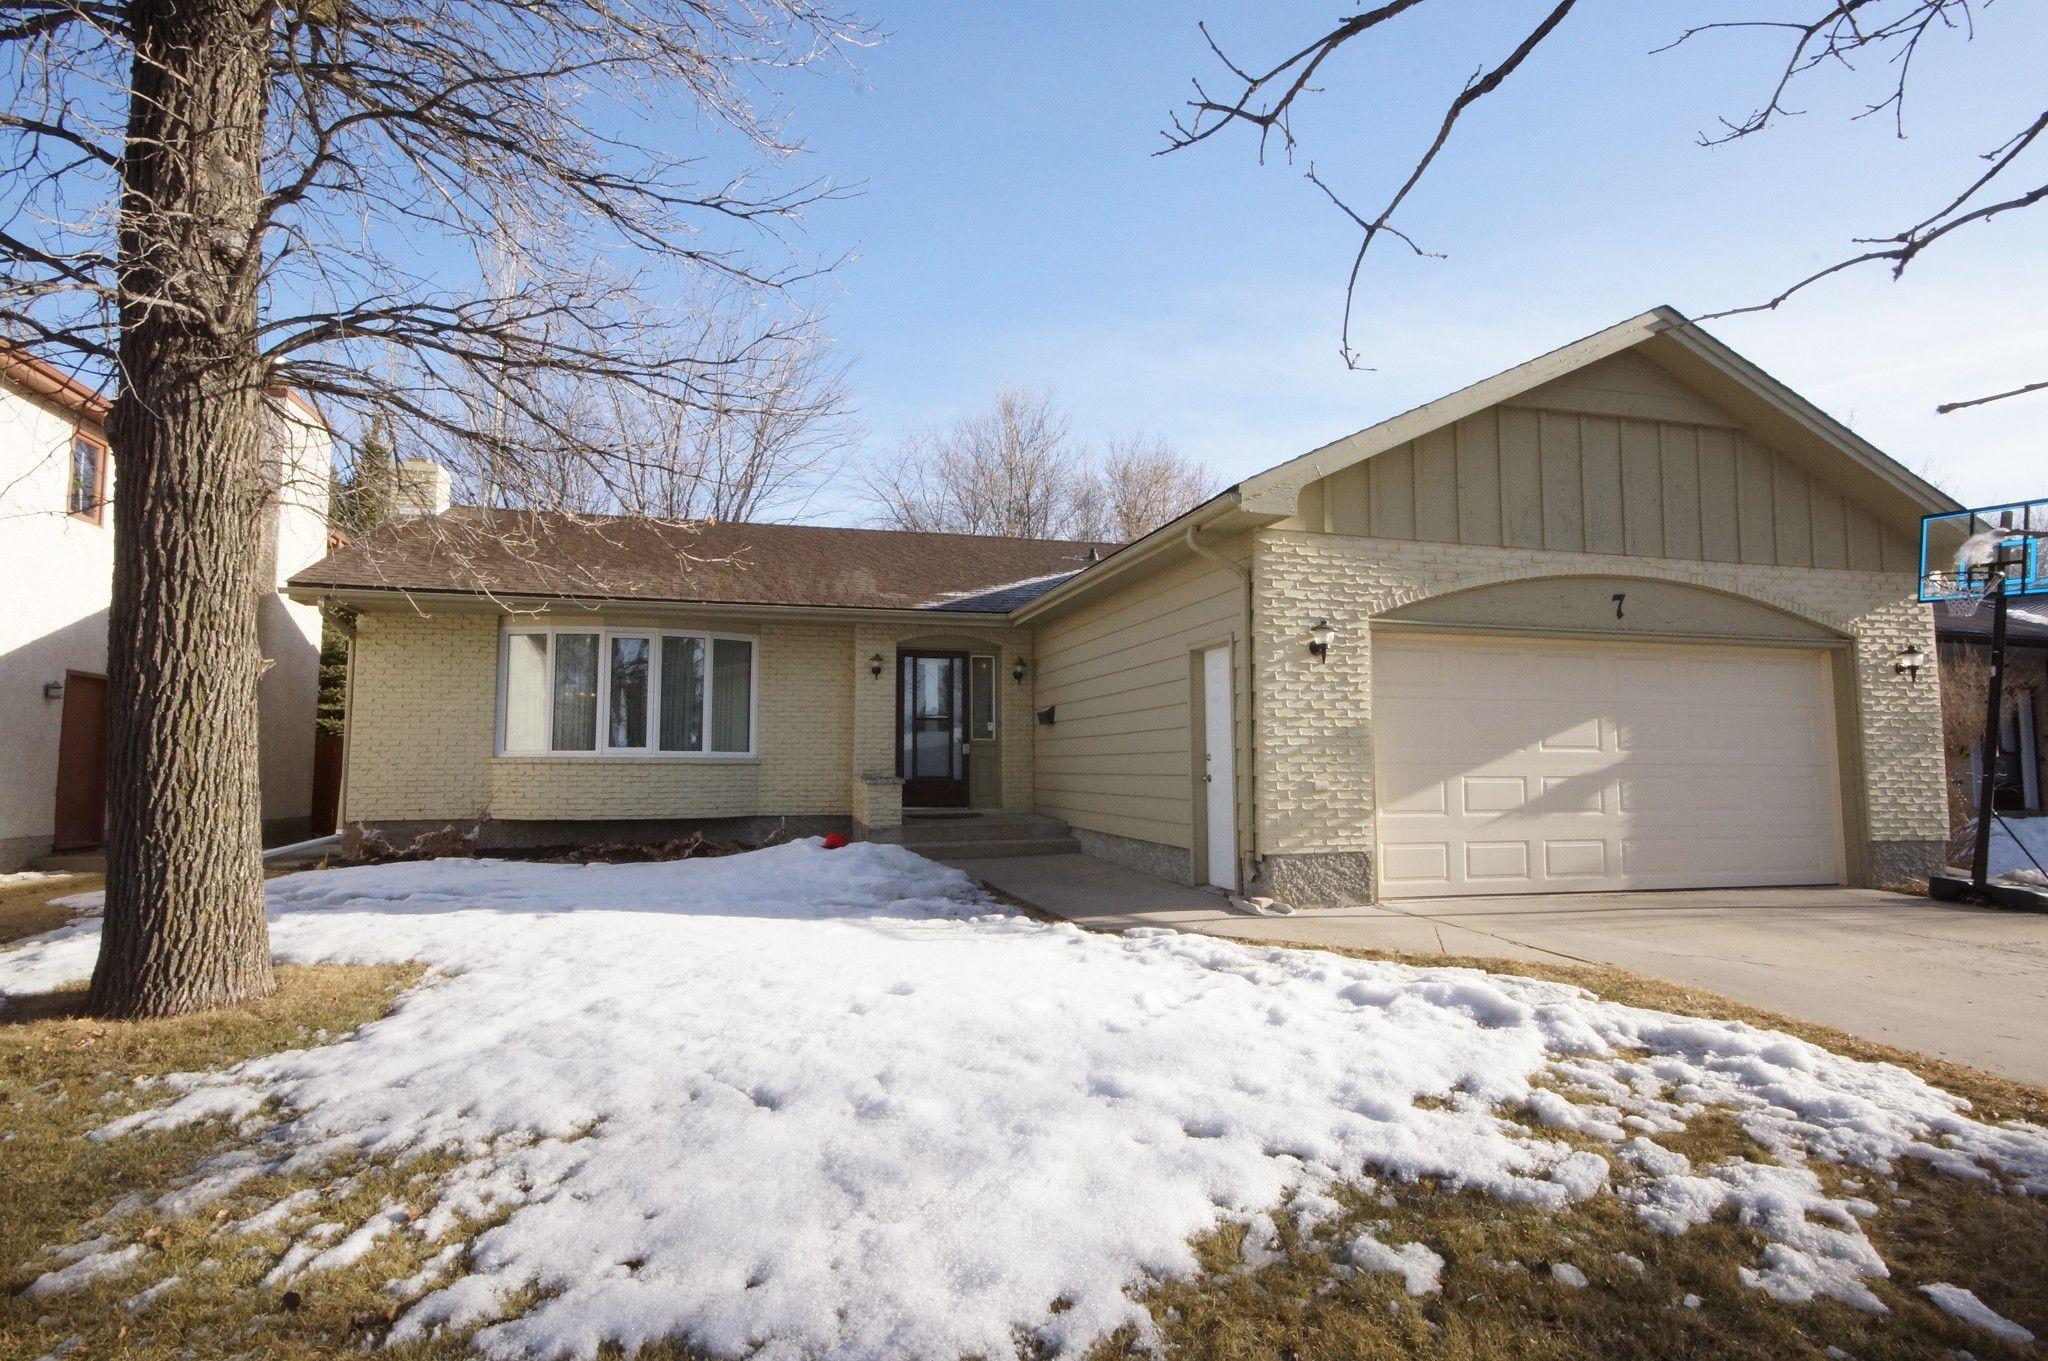 Main Photo: 7 Oswald Bay in Winnipeg: House for sale (Charleswood)  : MLS®# 1808228